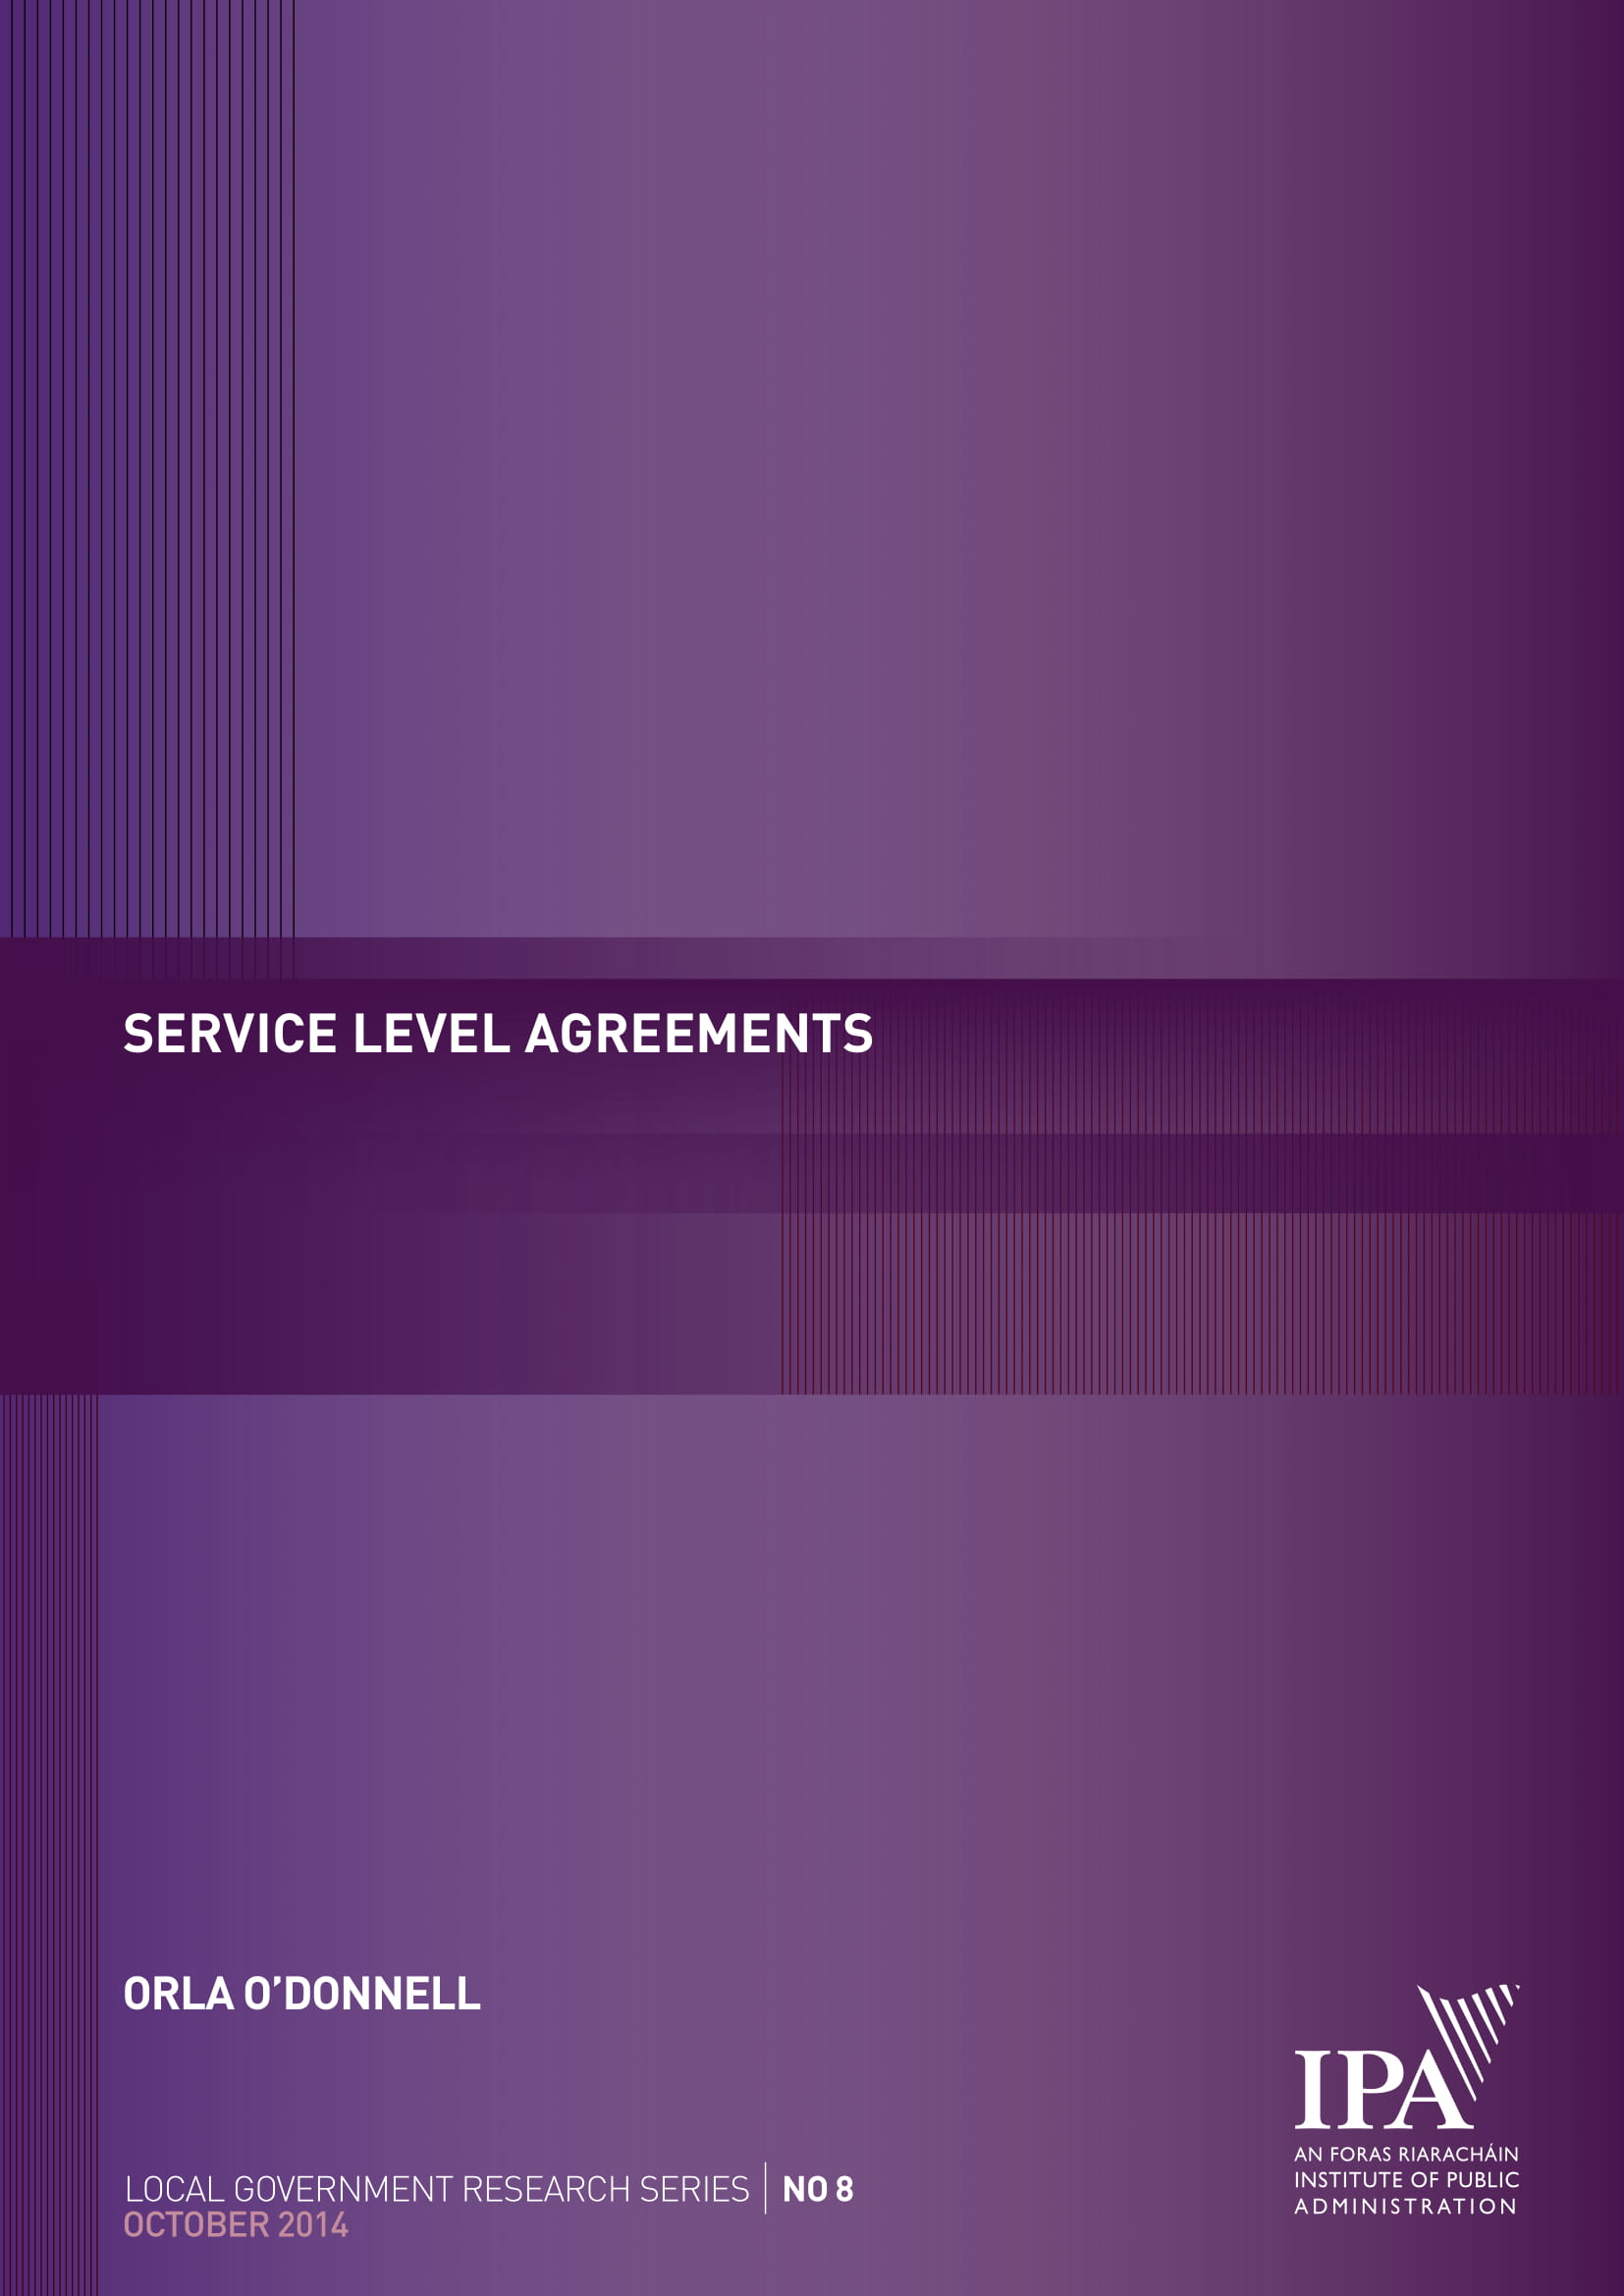 basic service level agreement example 01